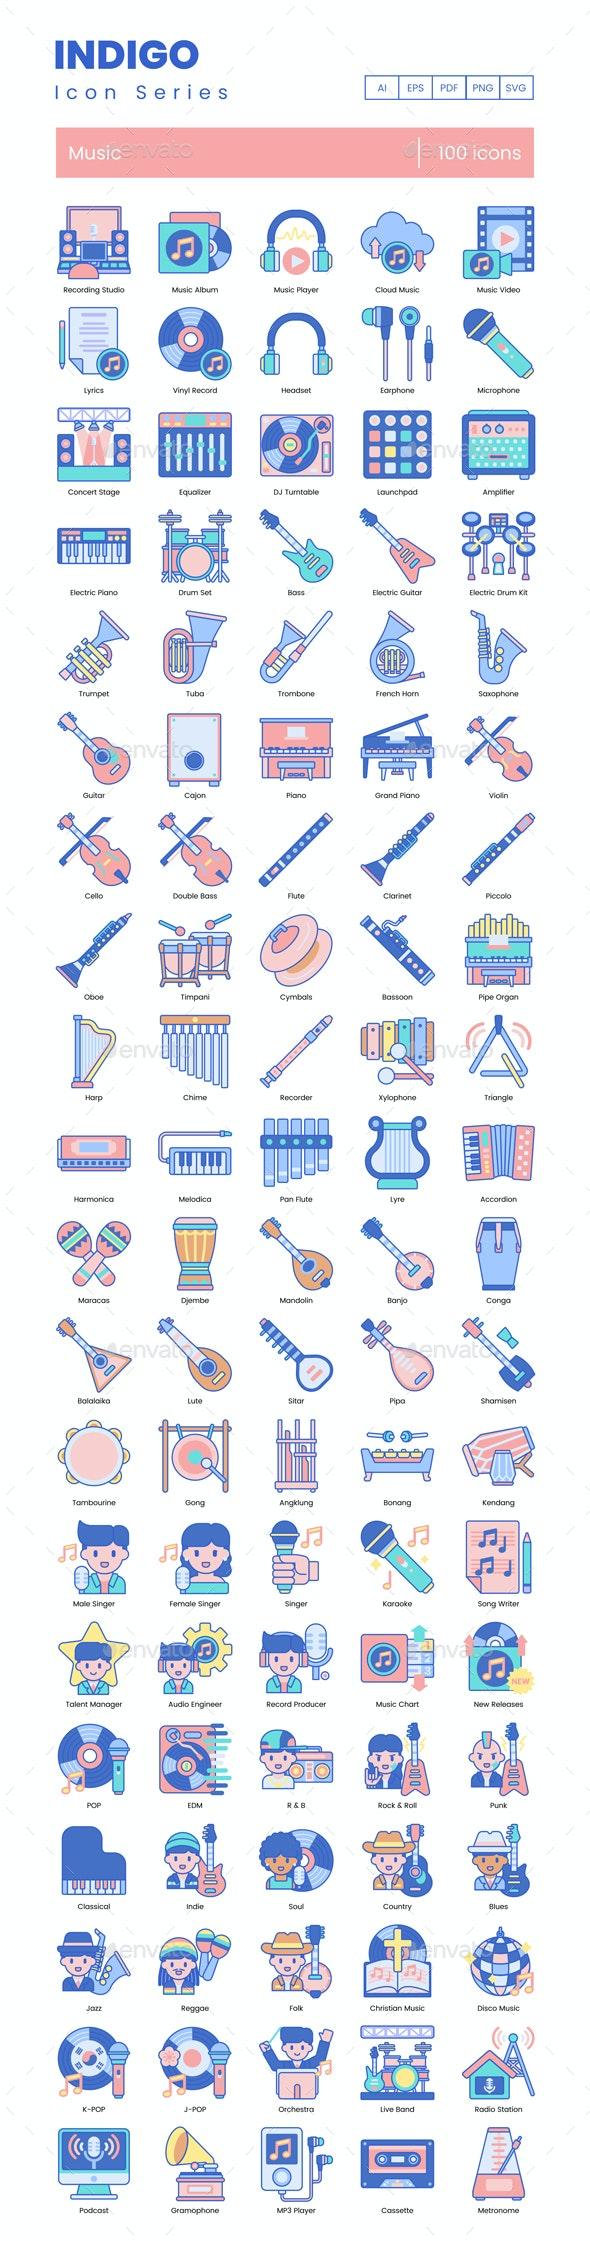 Music Icons - Indigo Series - Miscellaneous Icons